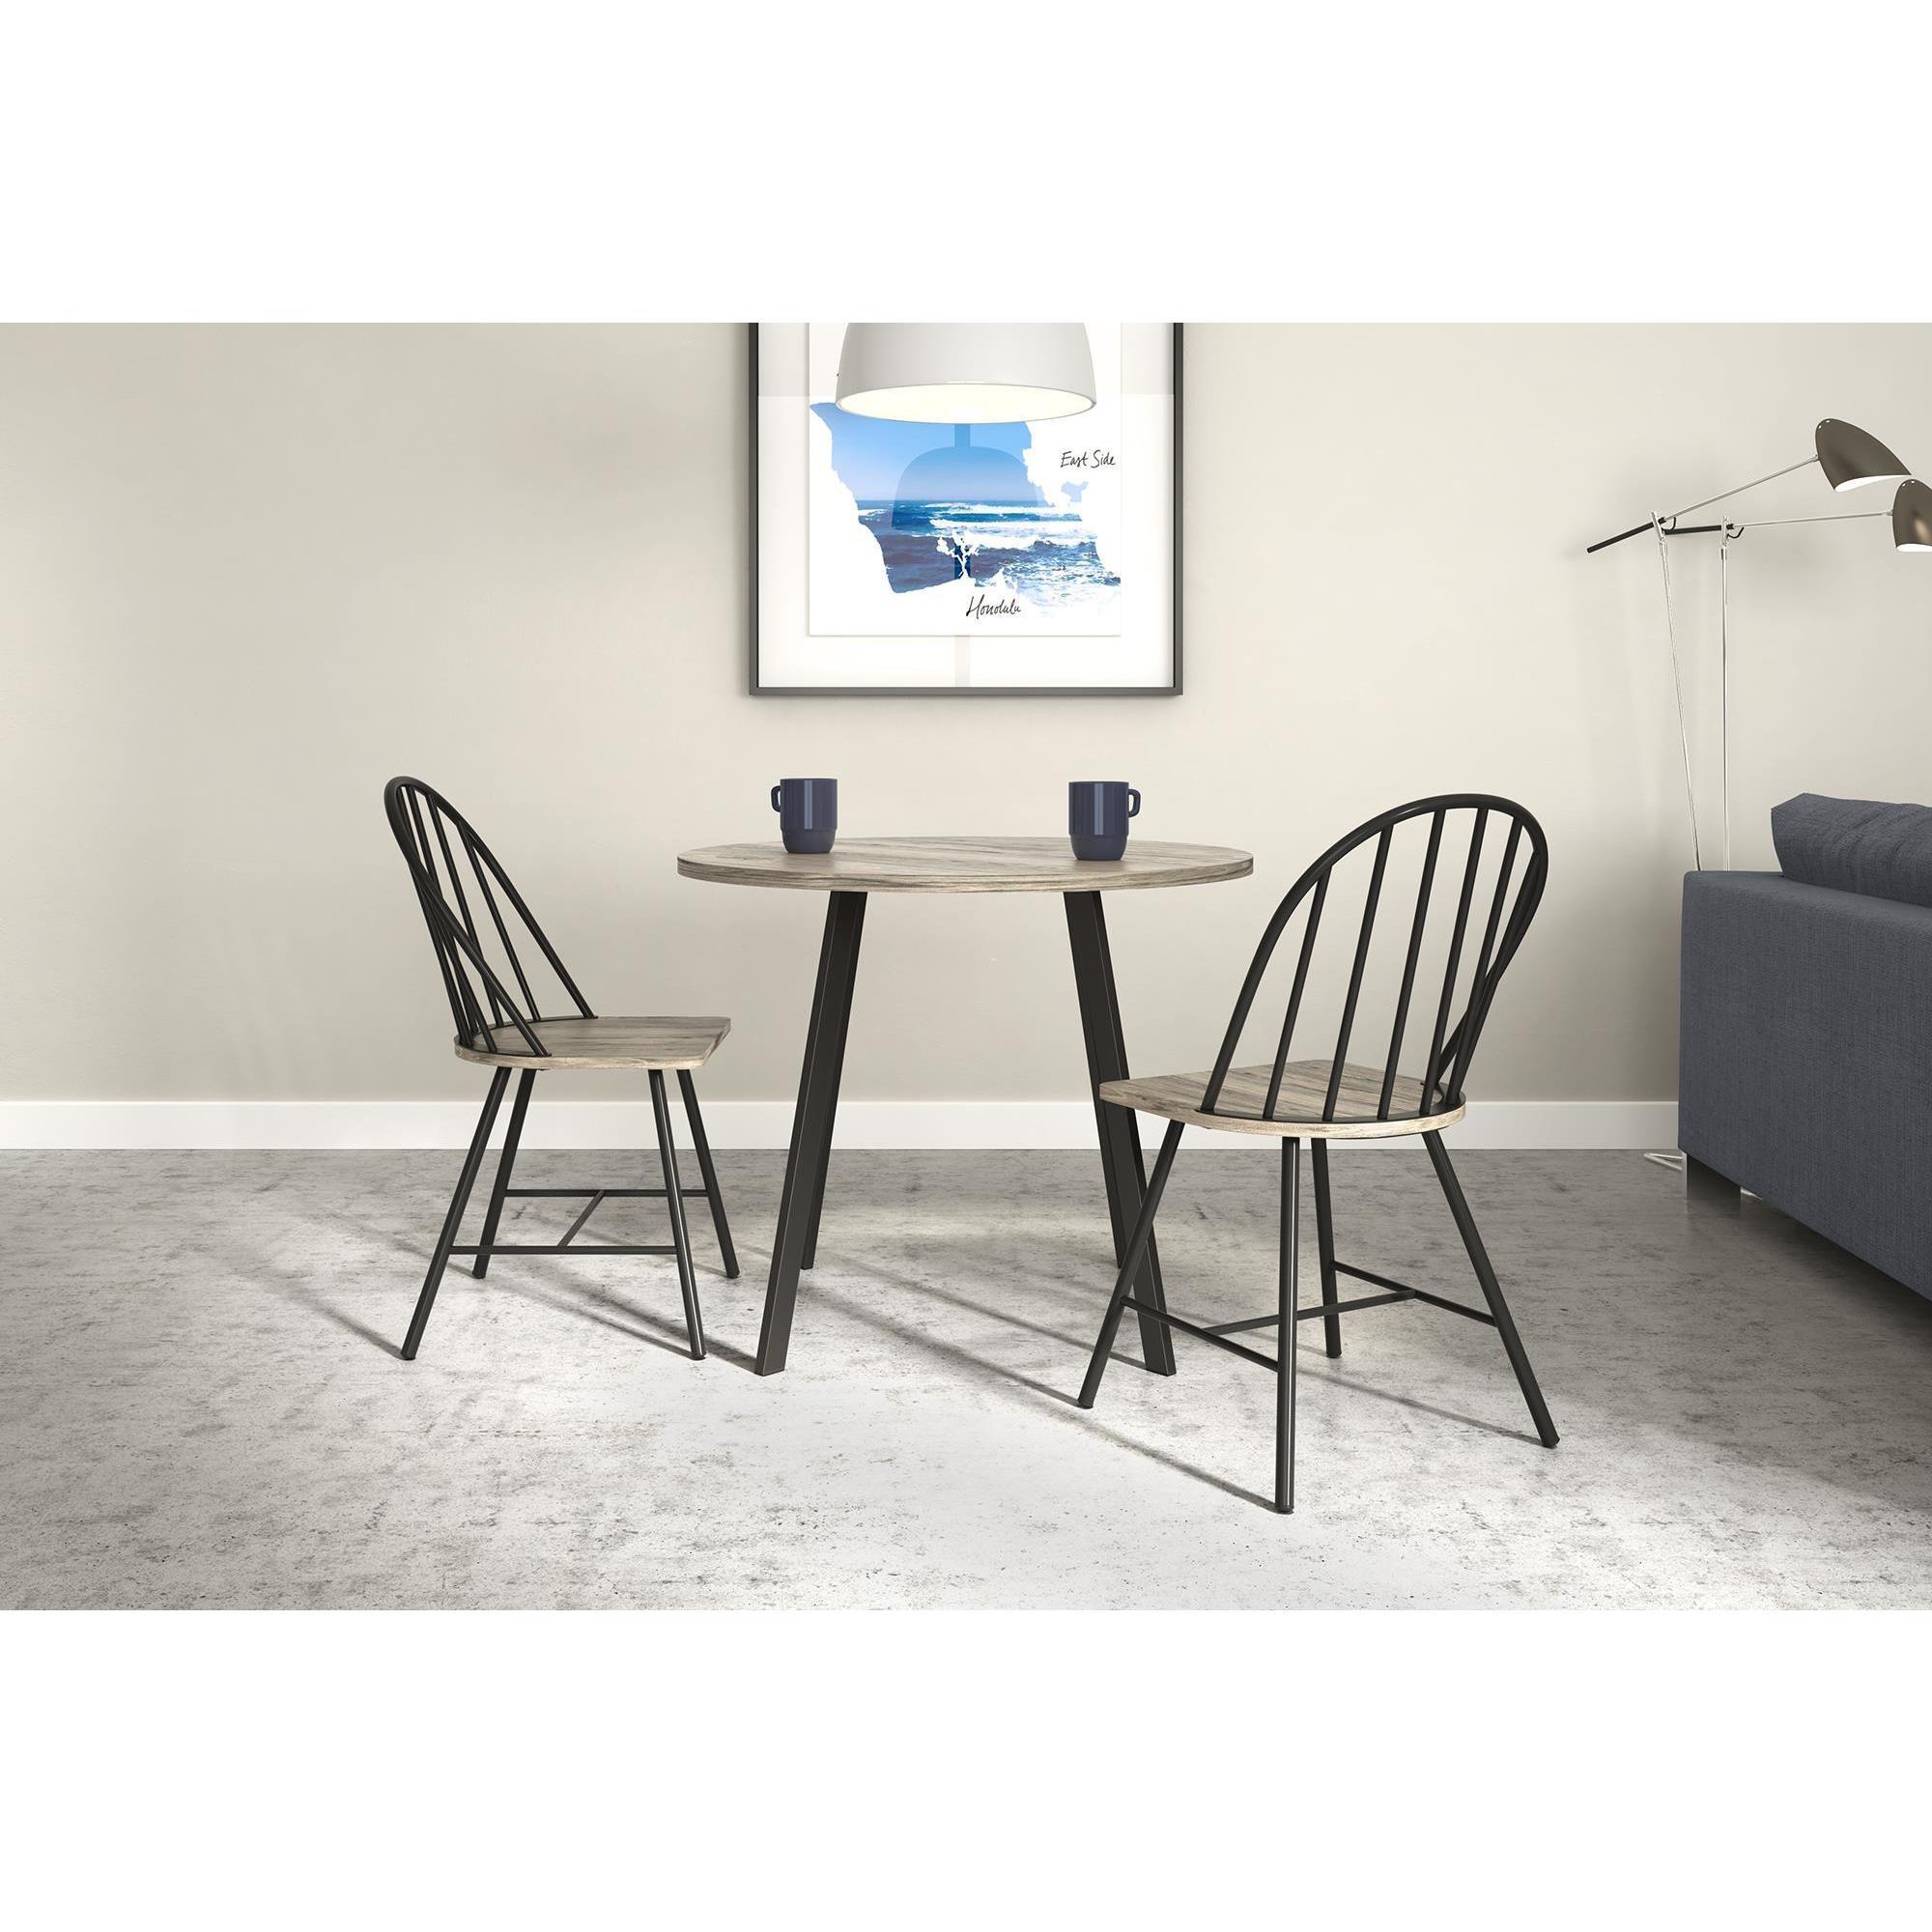 Novogratz Leo Black Metal Farmhouse Dining Chair With Grey Wood Seat Overstock 17760019